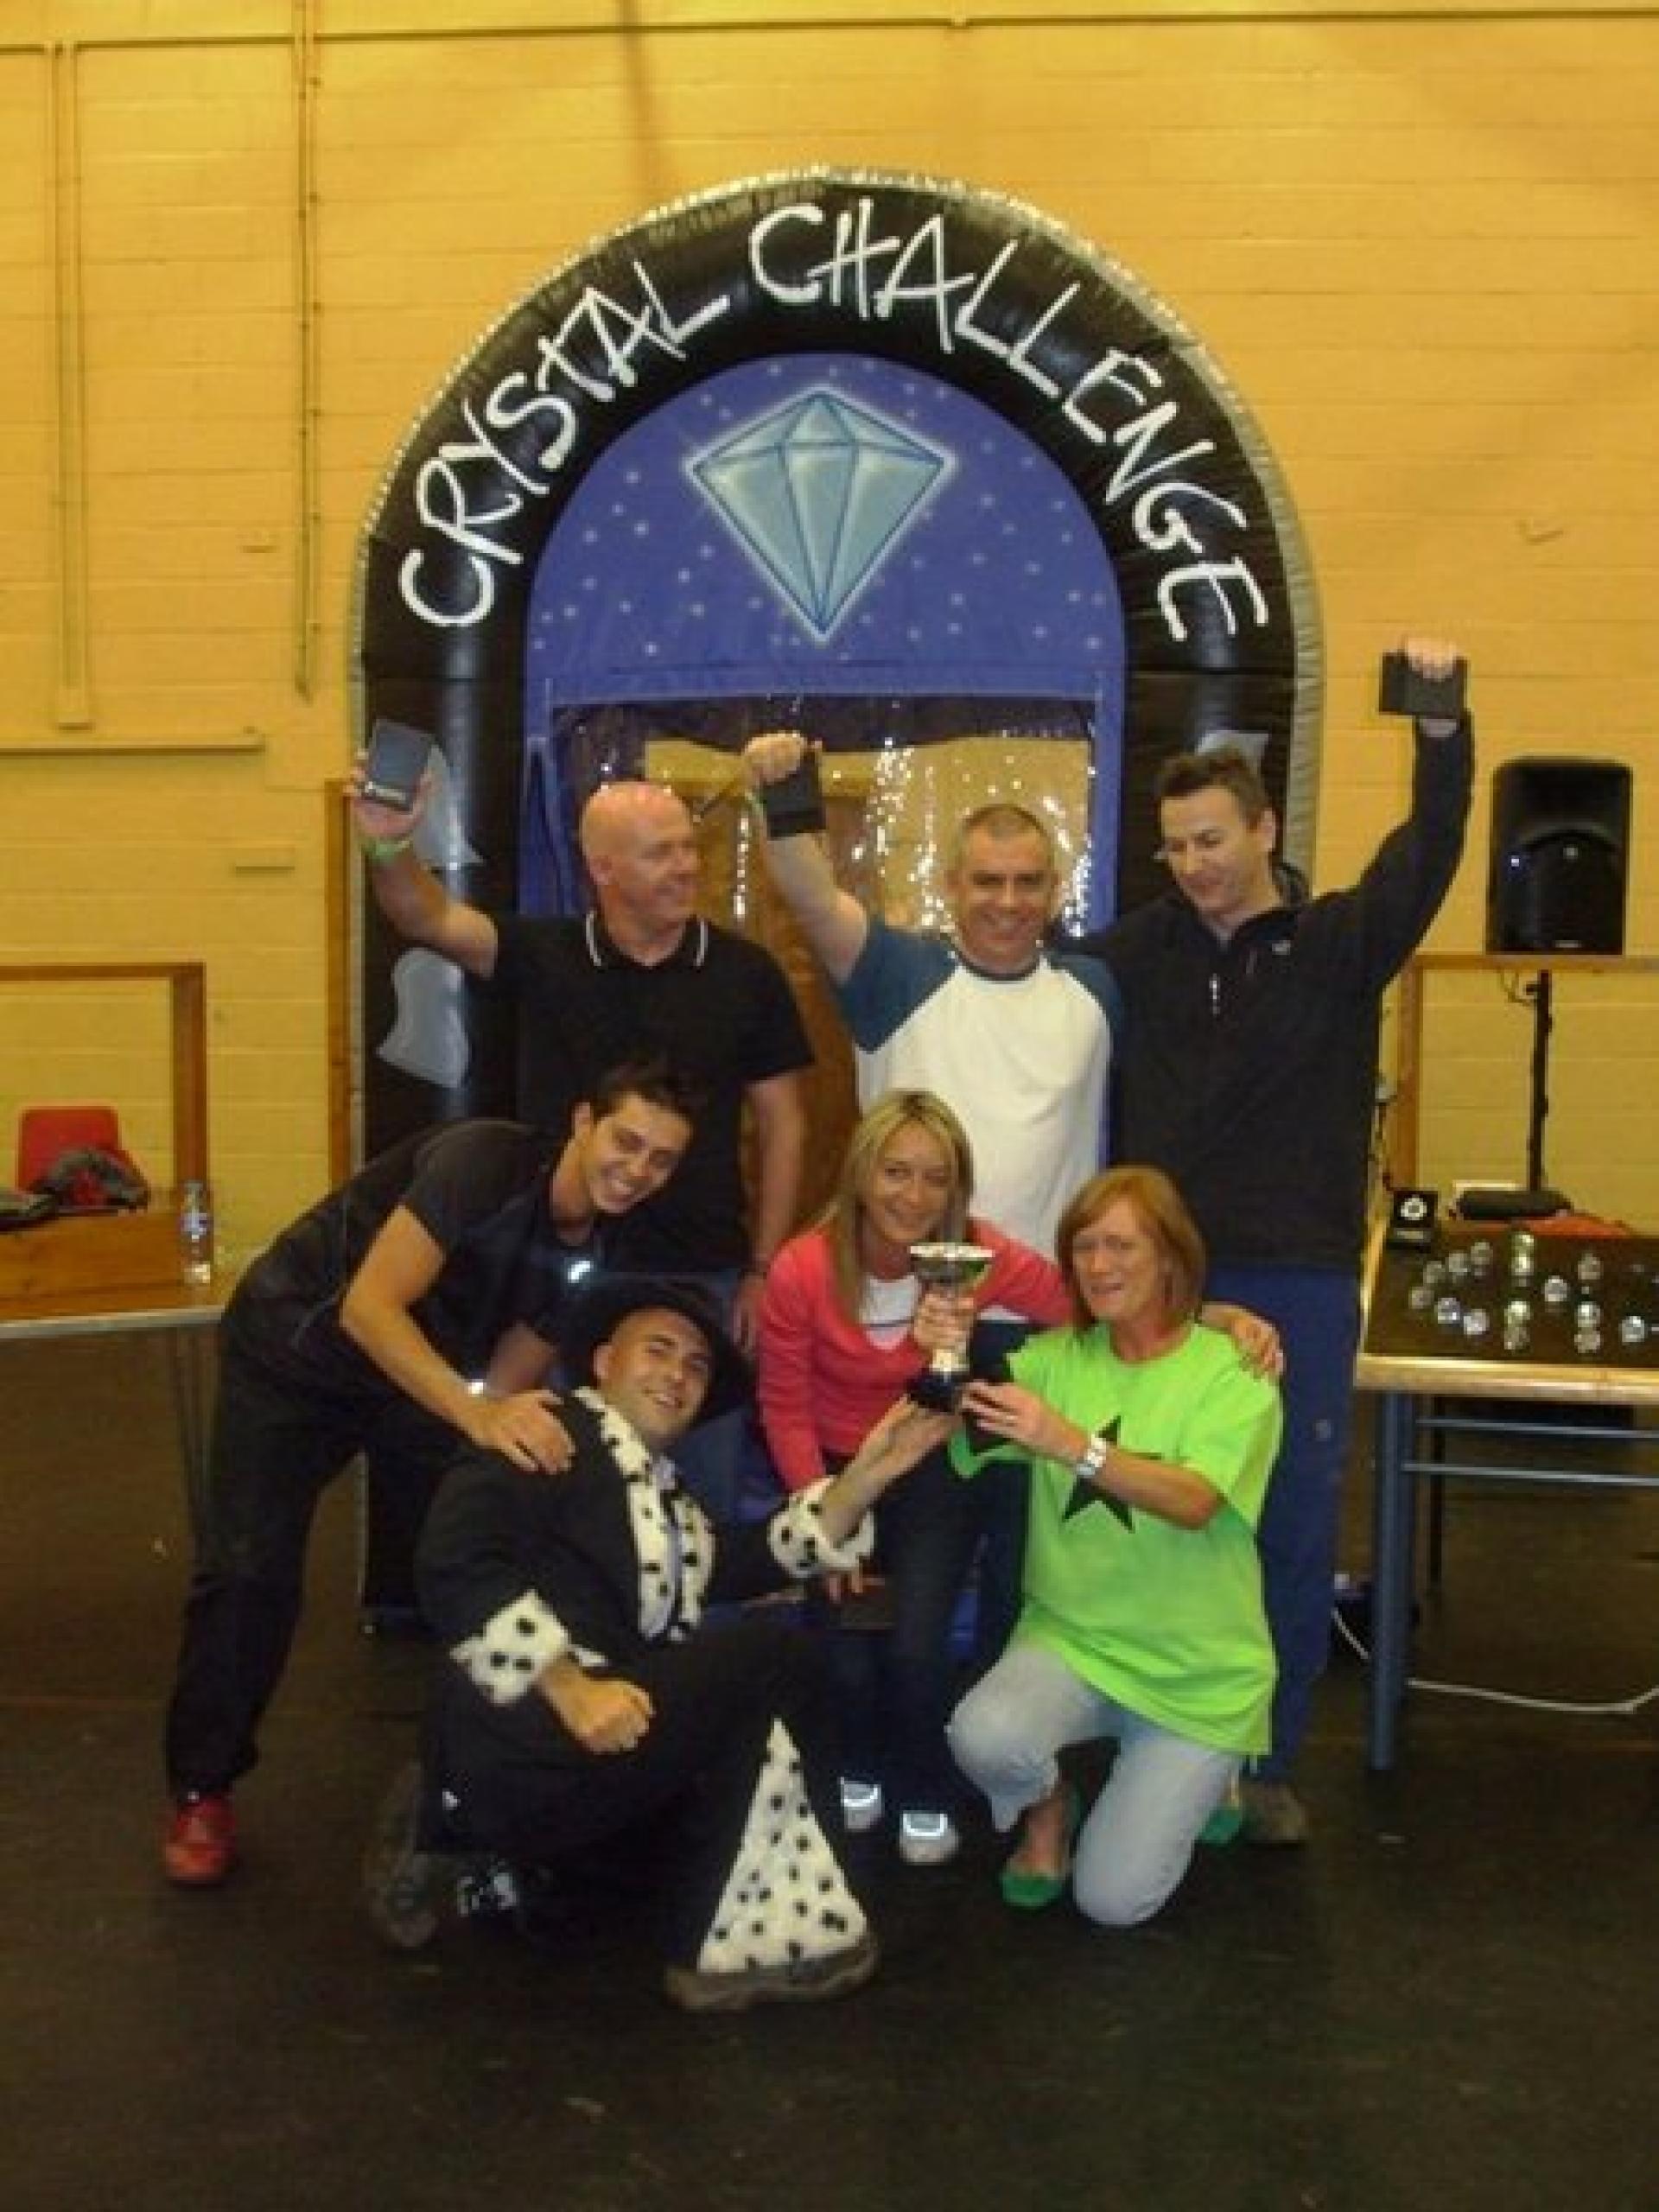 Crystal Challenge Team Event